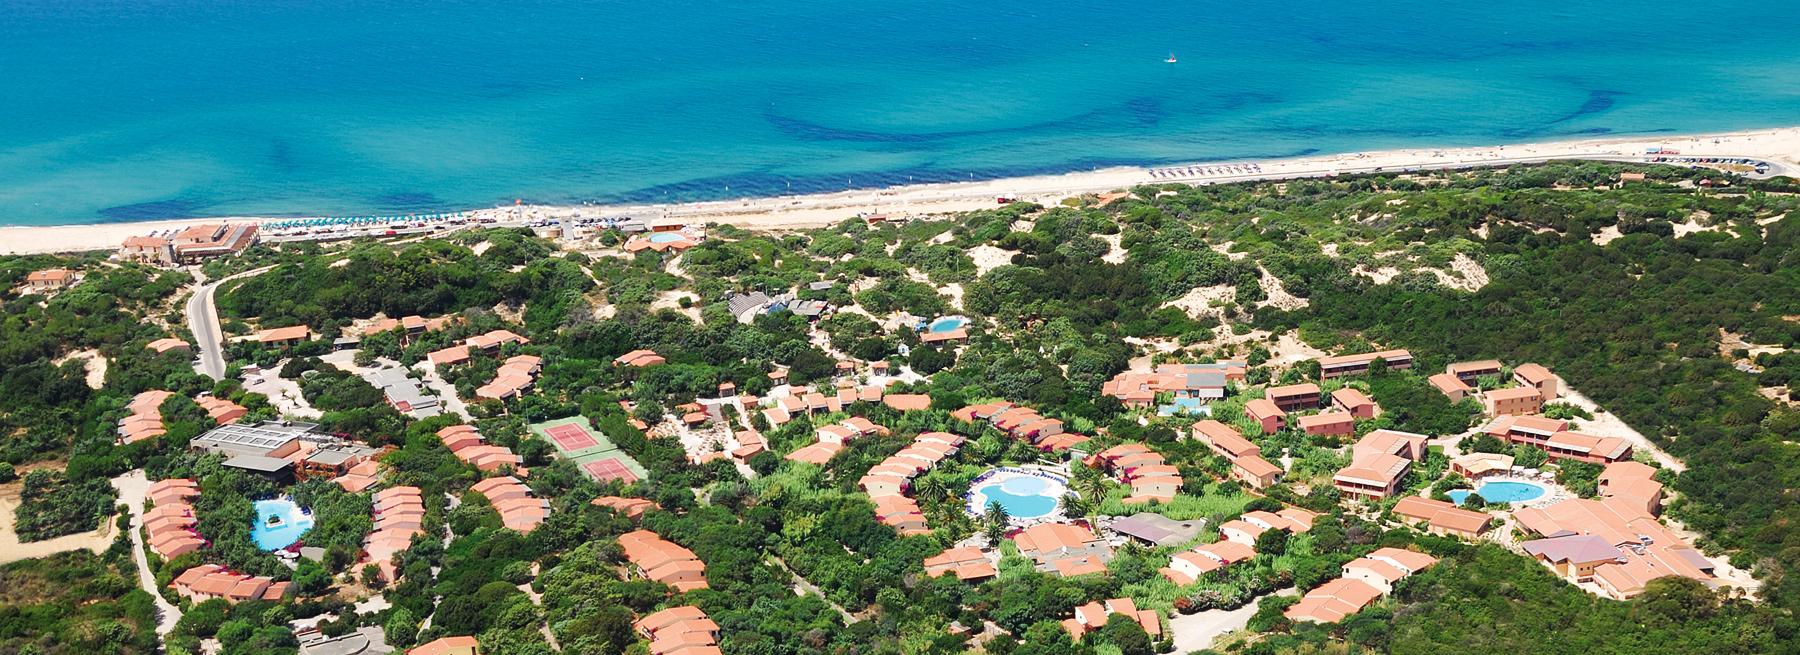 Delphina Tarifas Resort Le Dune 2017 Badesi Cerdena - Italia